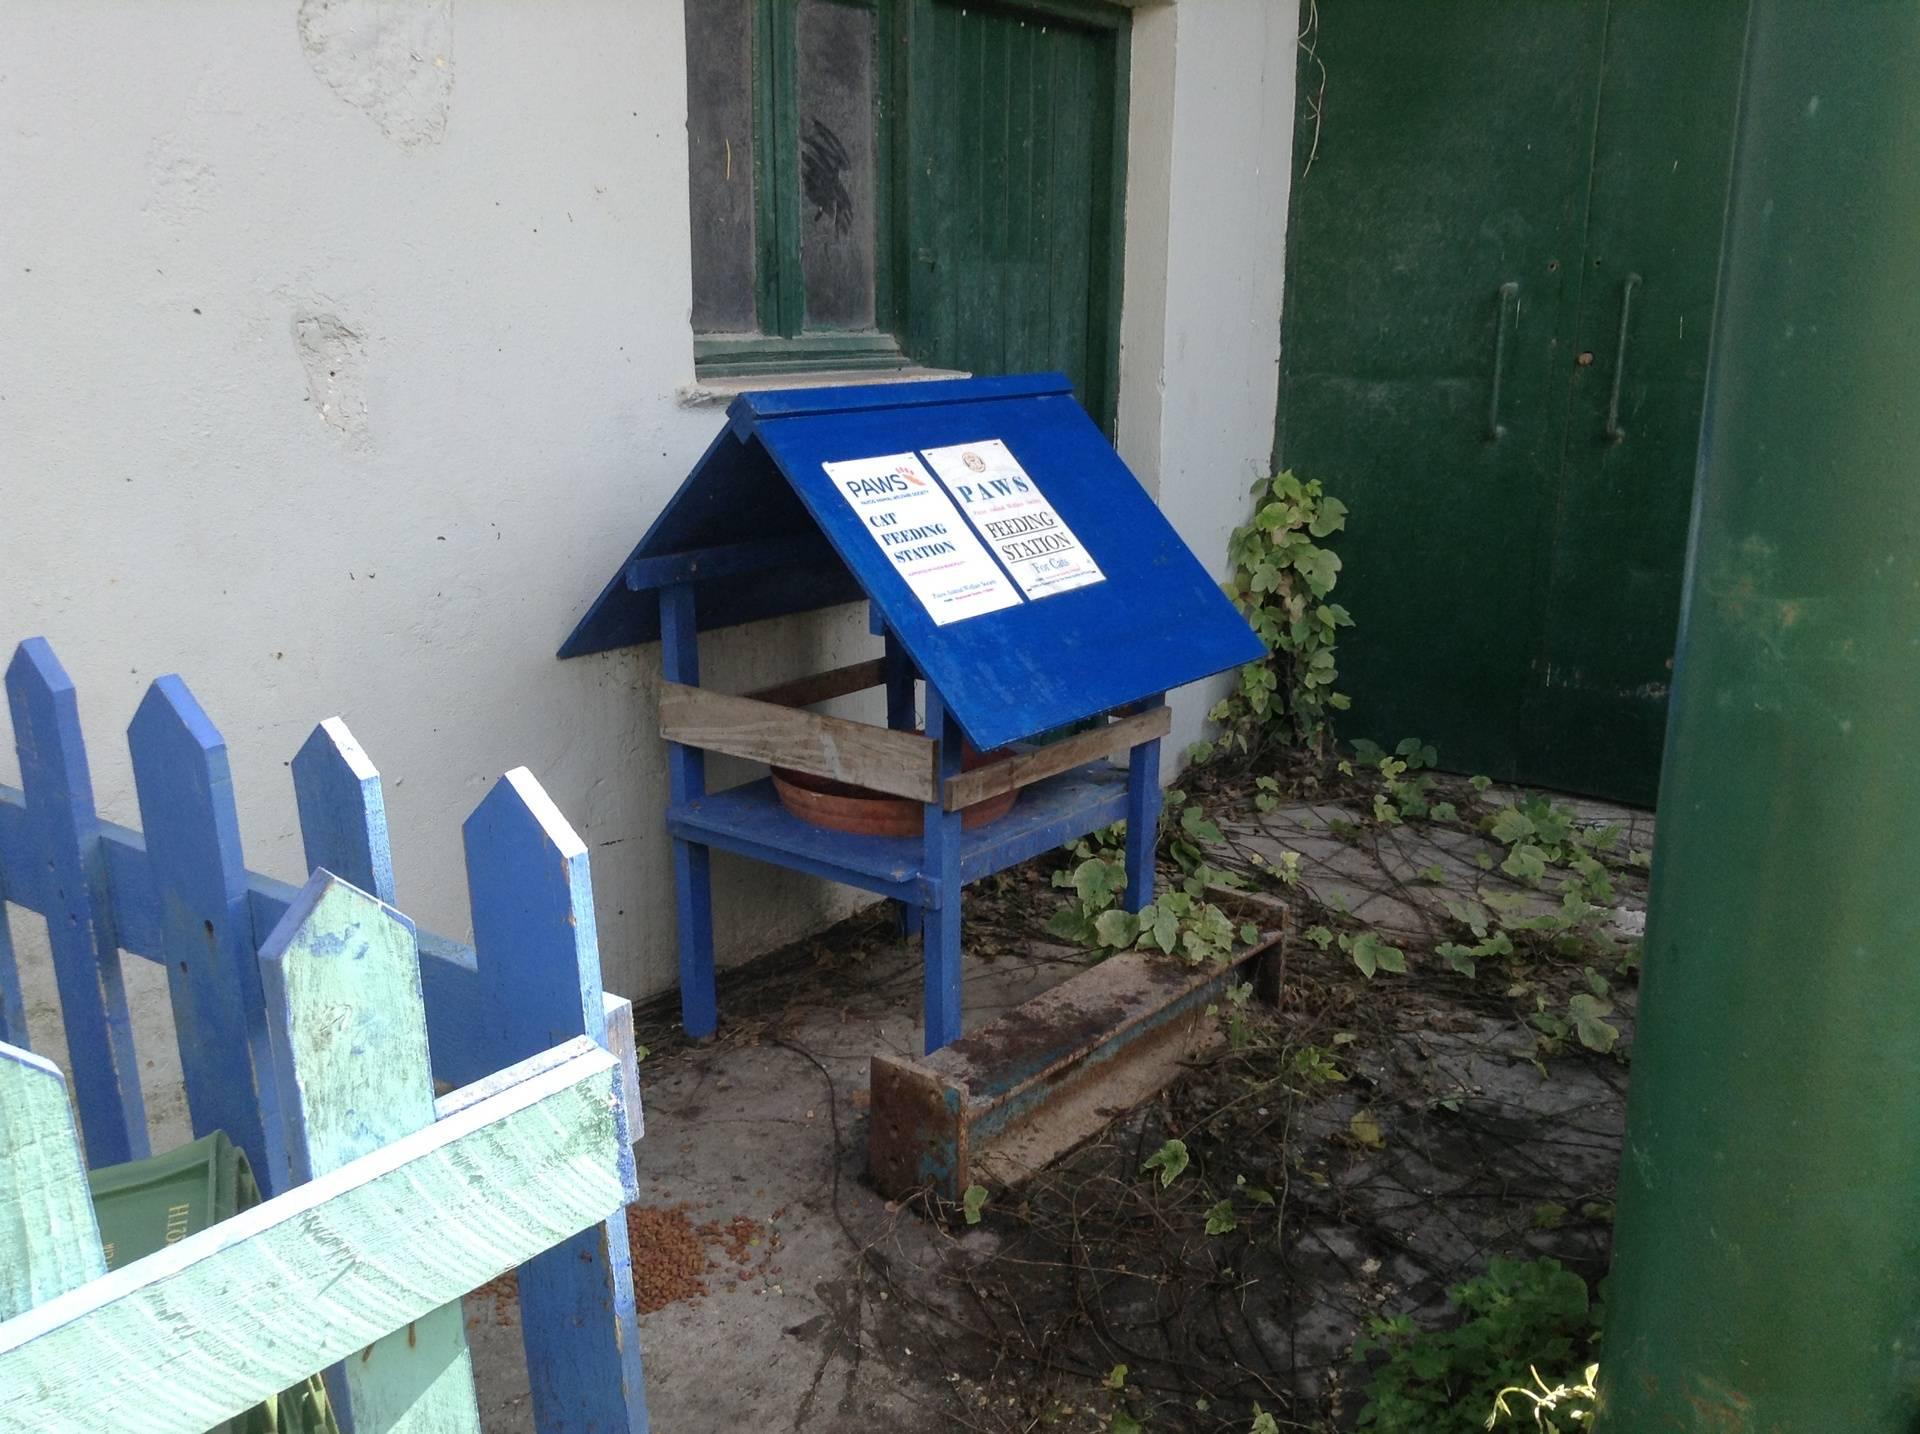 Lakka feeding station